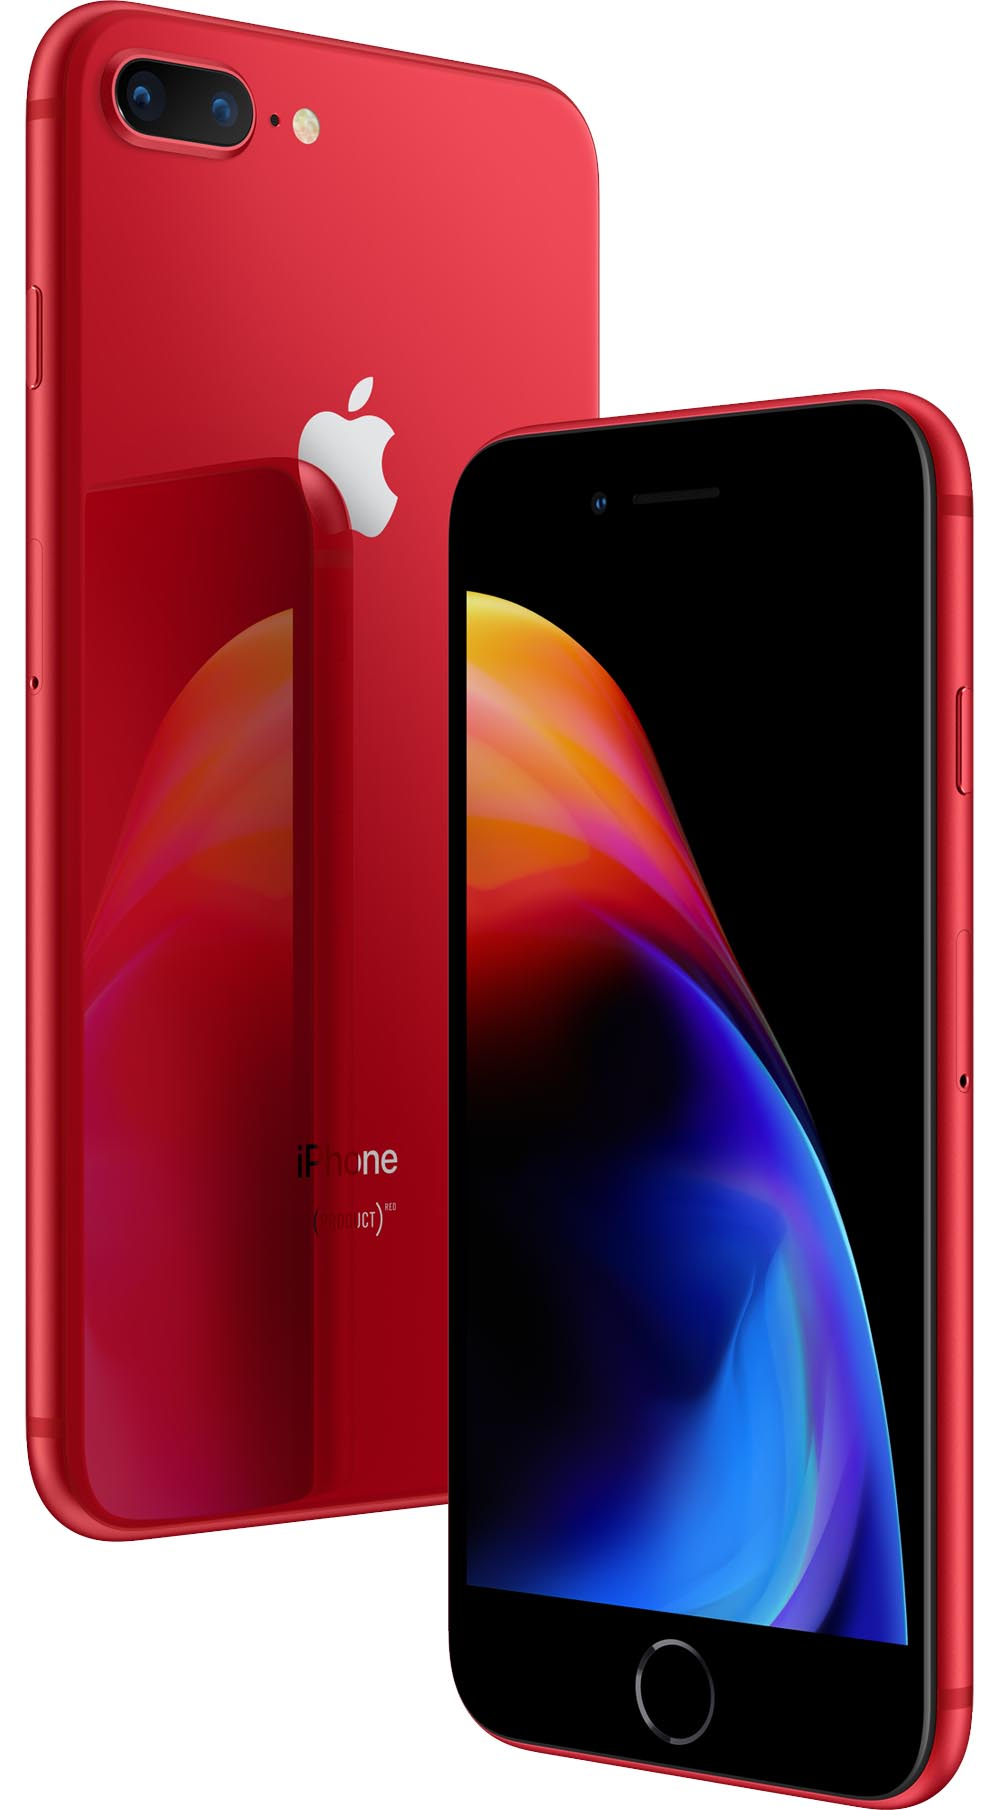 consomac apple annonce un iphone 8 rouge. Black Bedroom Furniture Sets. Home Design Ideas